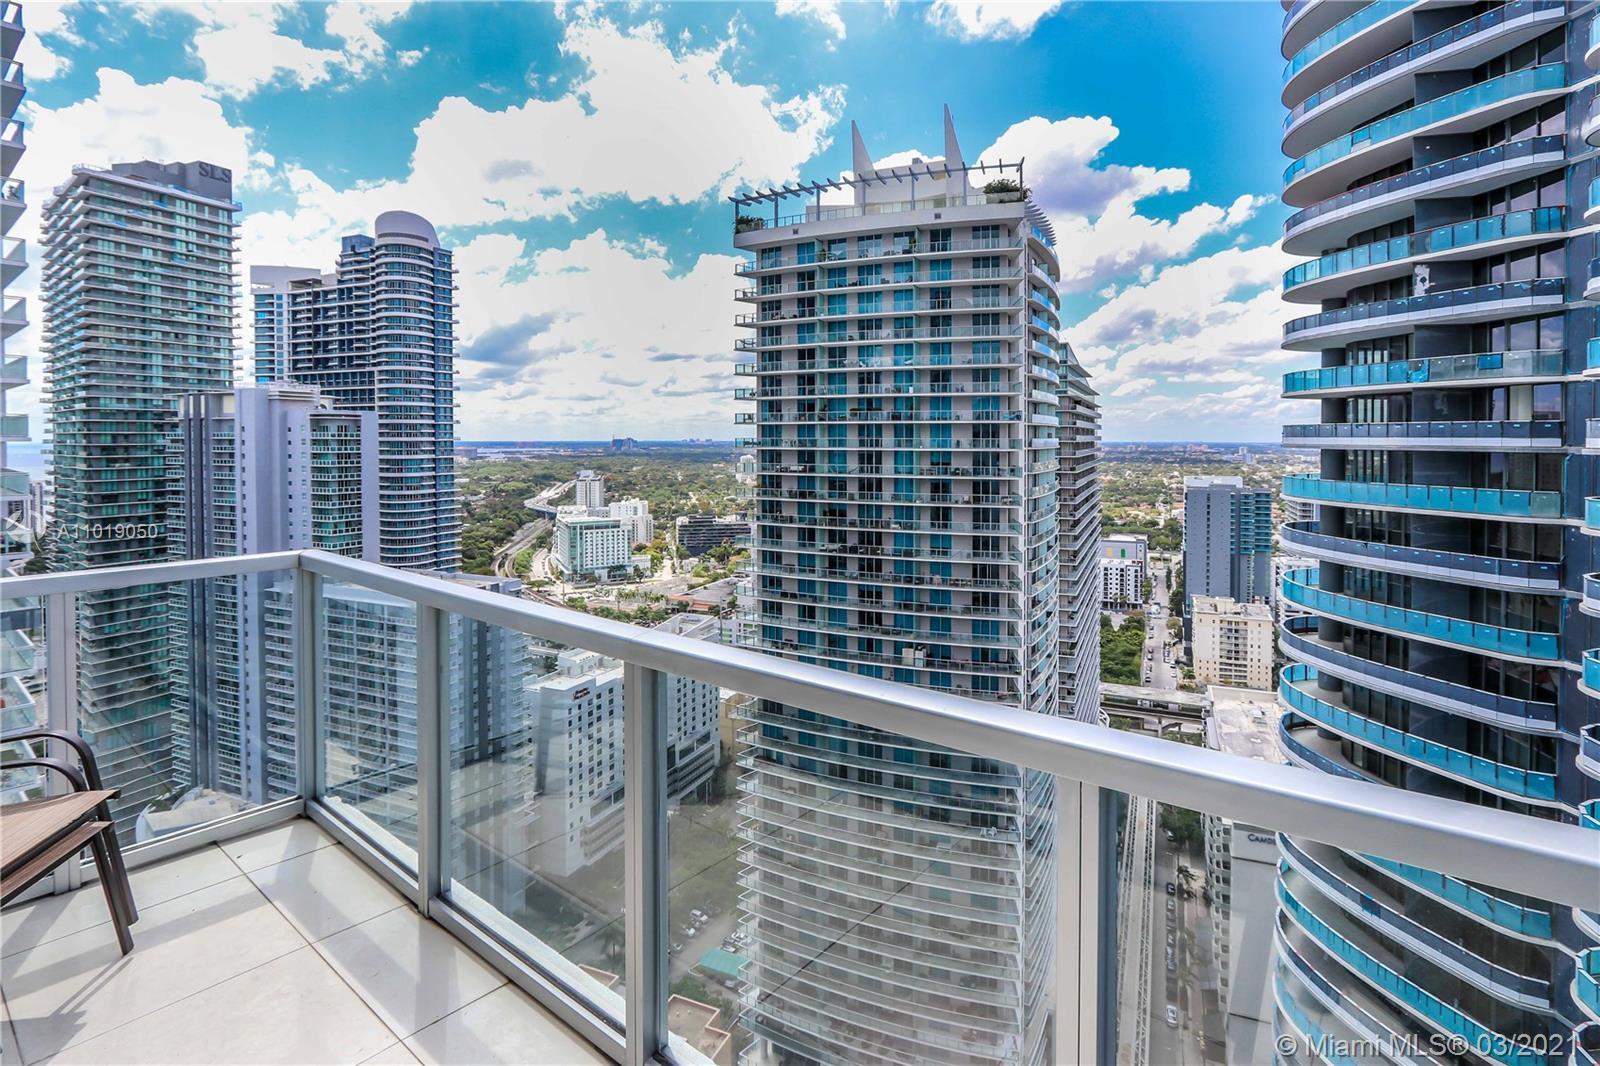 1060 Brickell East Tower #3416 - 1050 Brickell Ave #3416, Miami, FL 33131